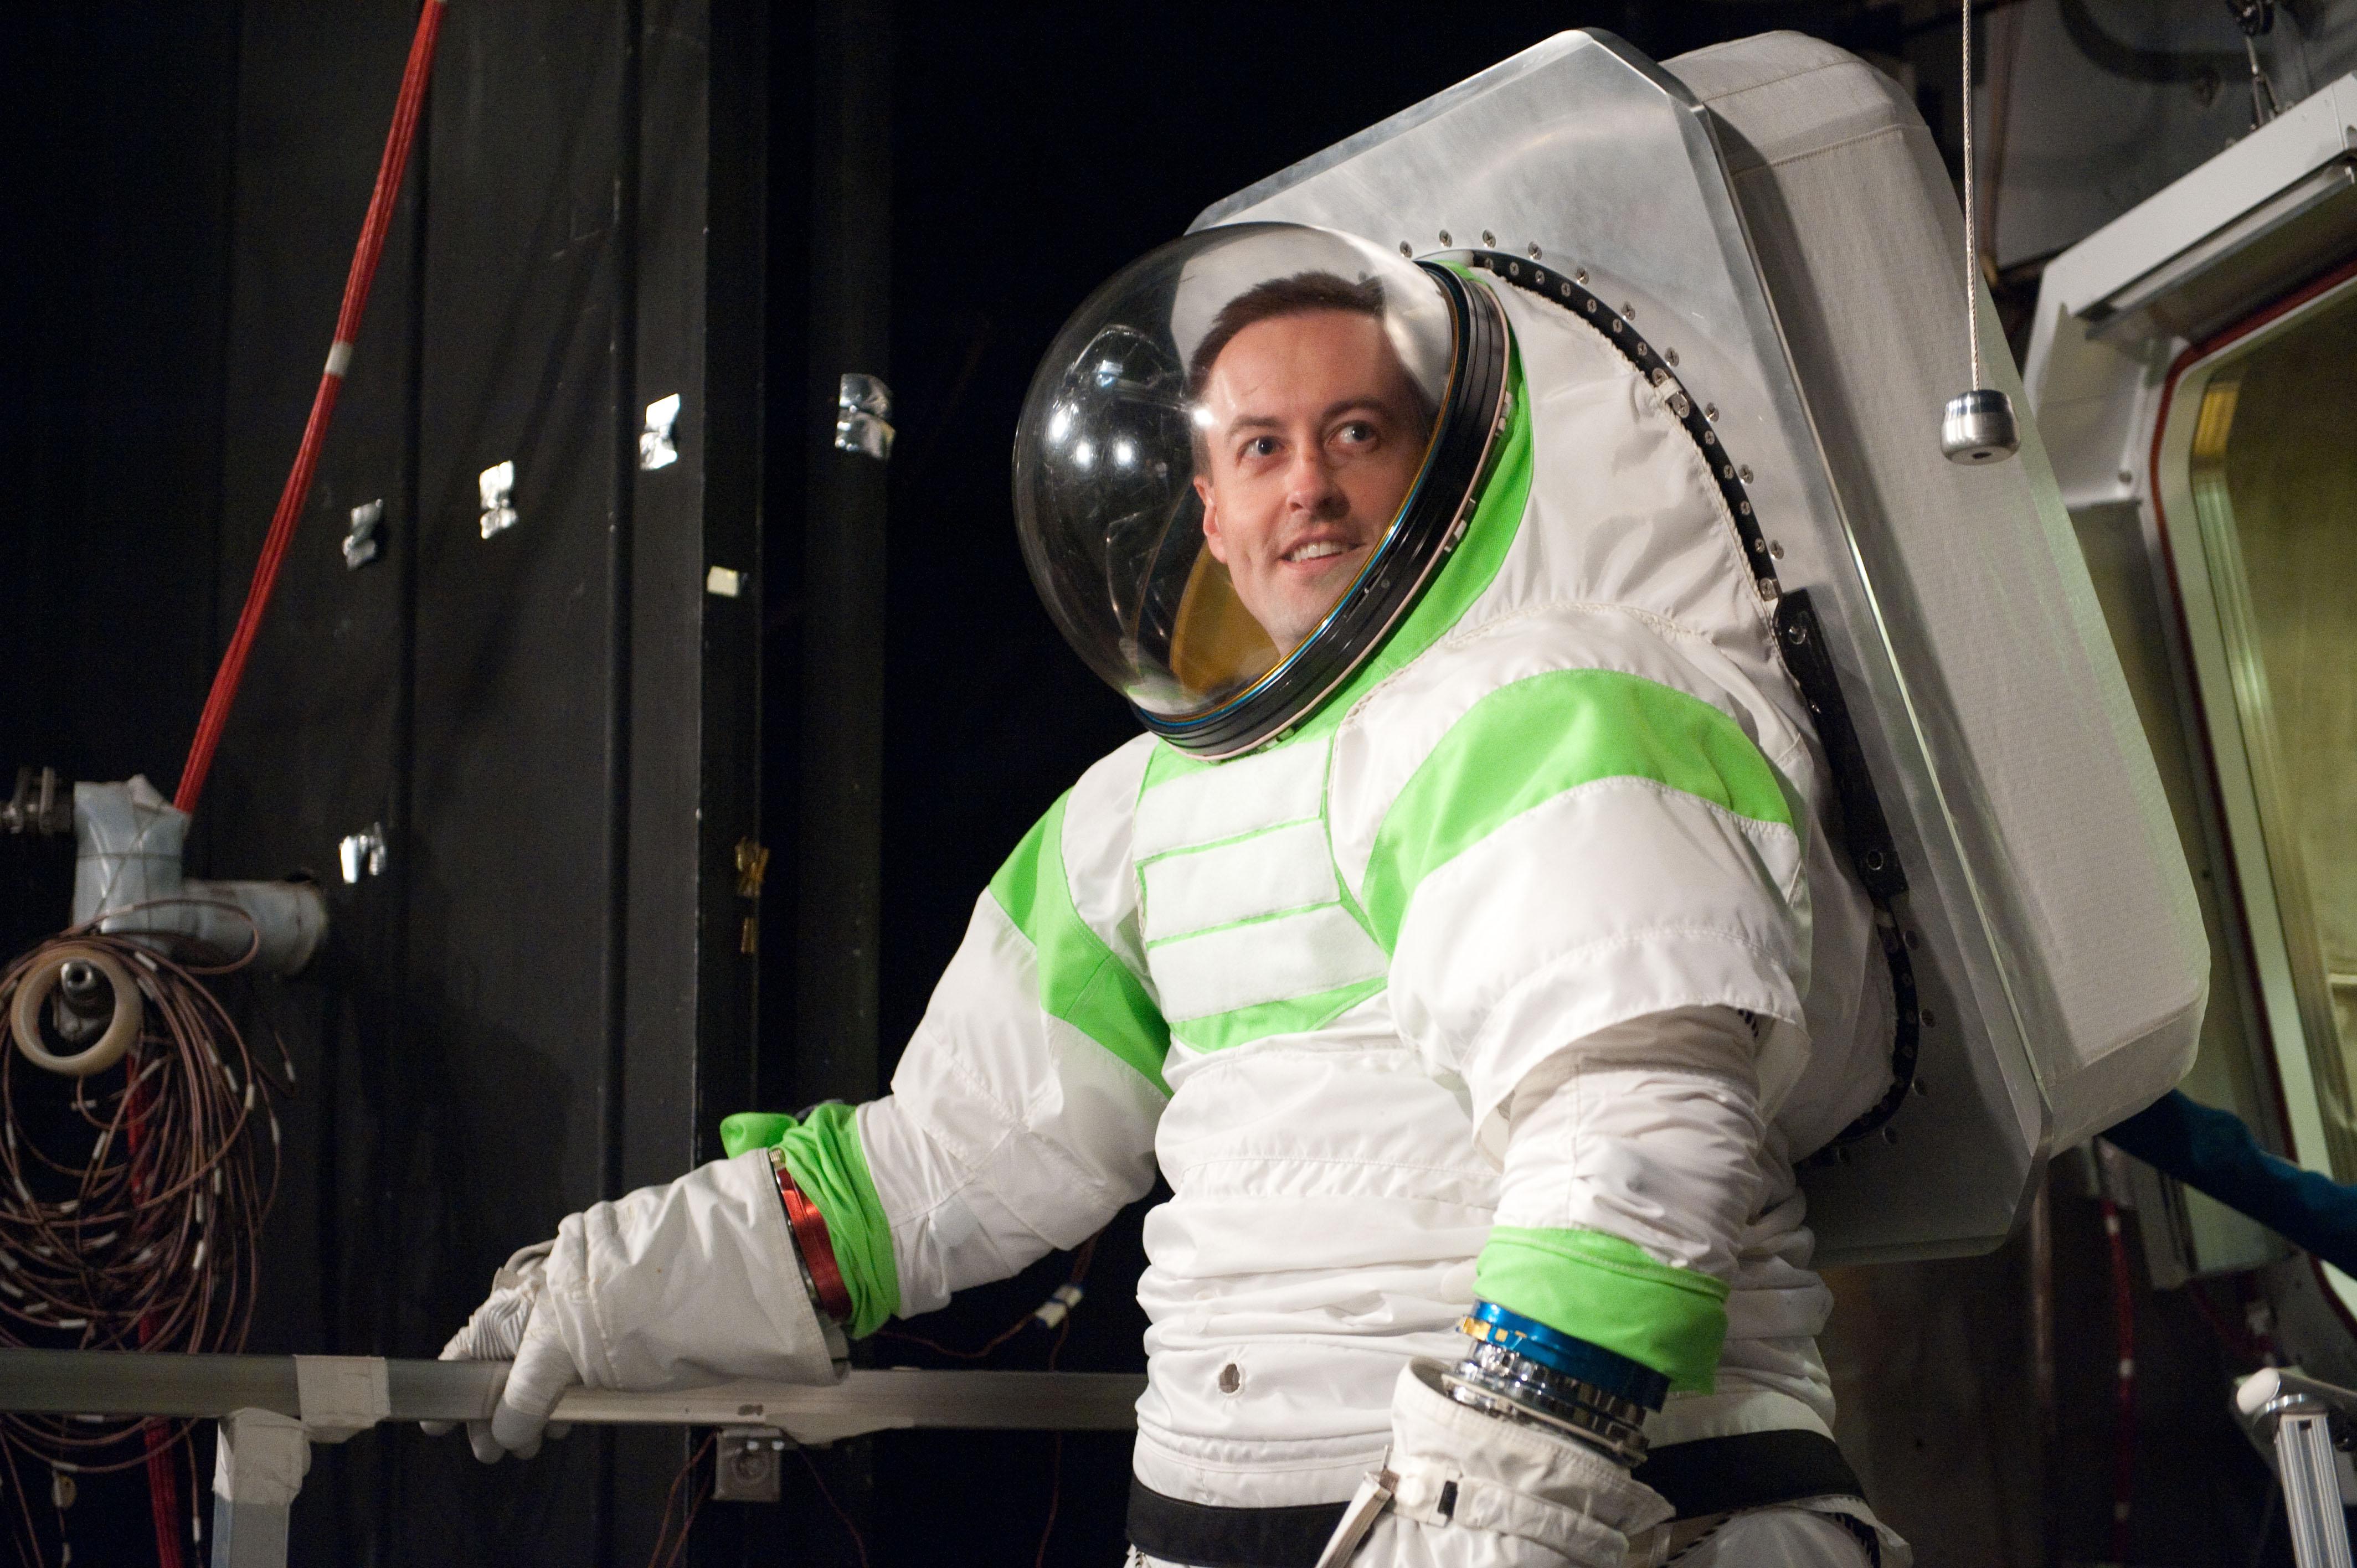 hd nasa space suit design - photo #22